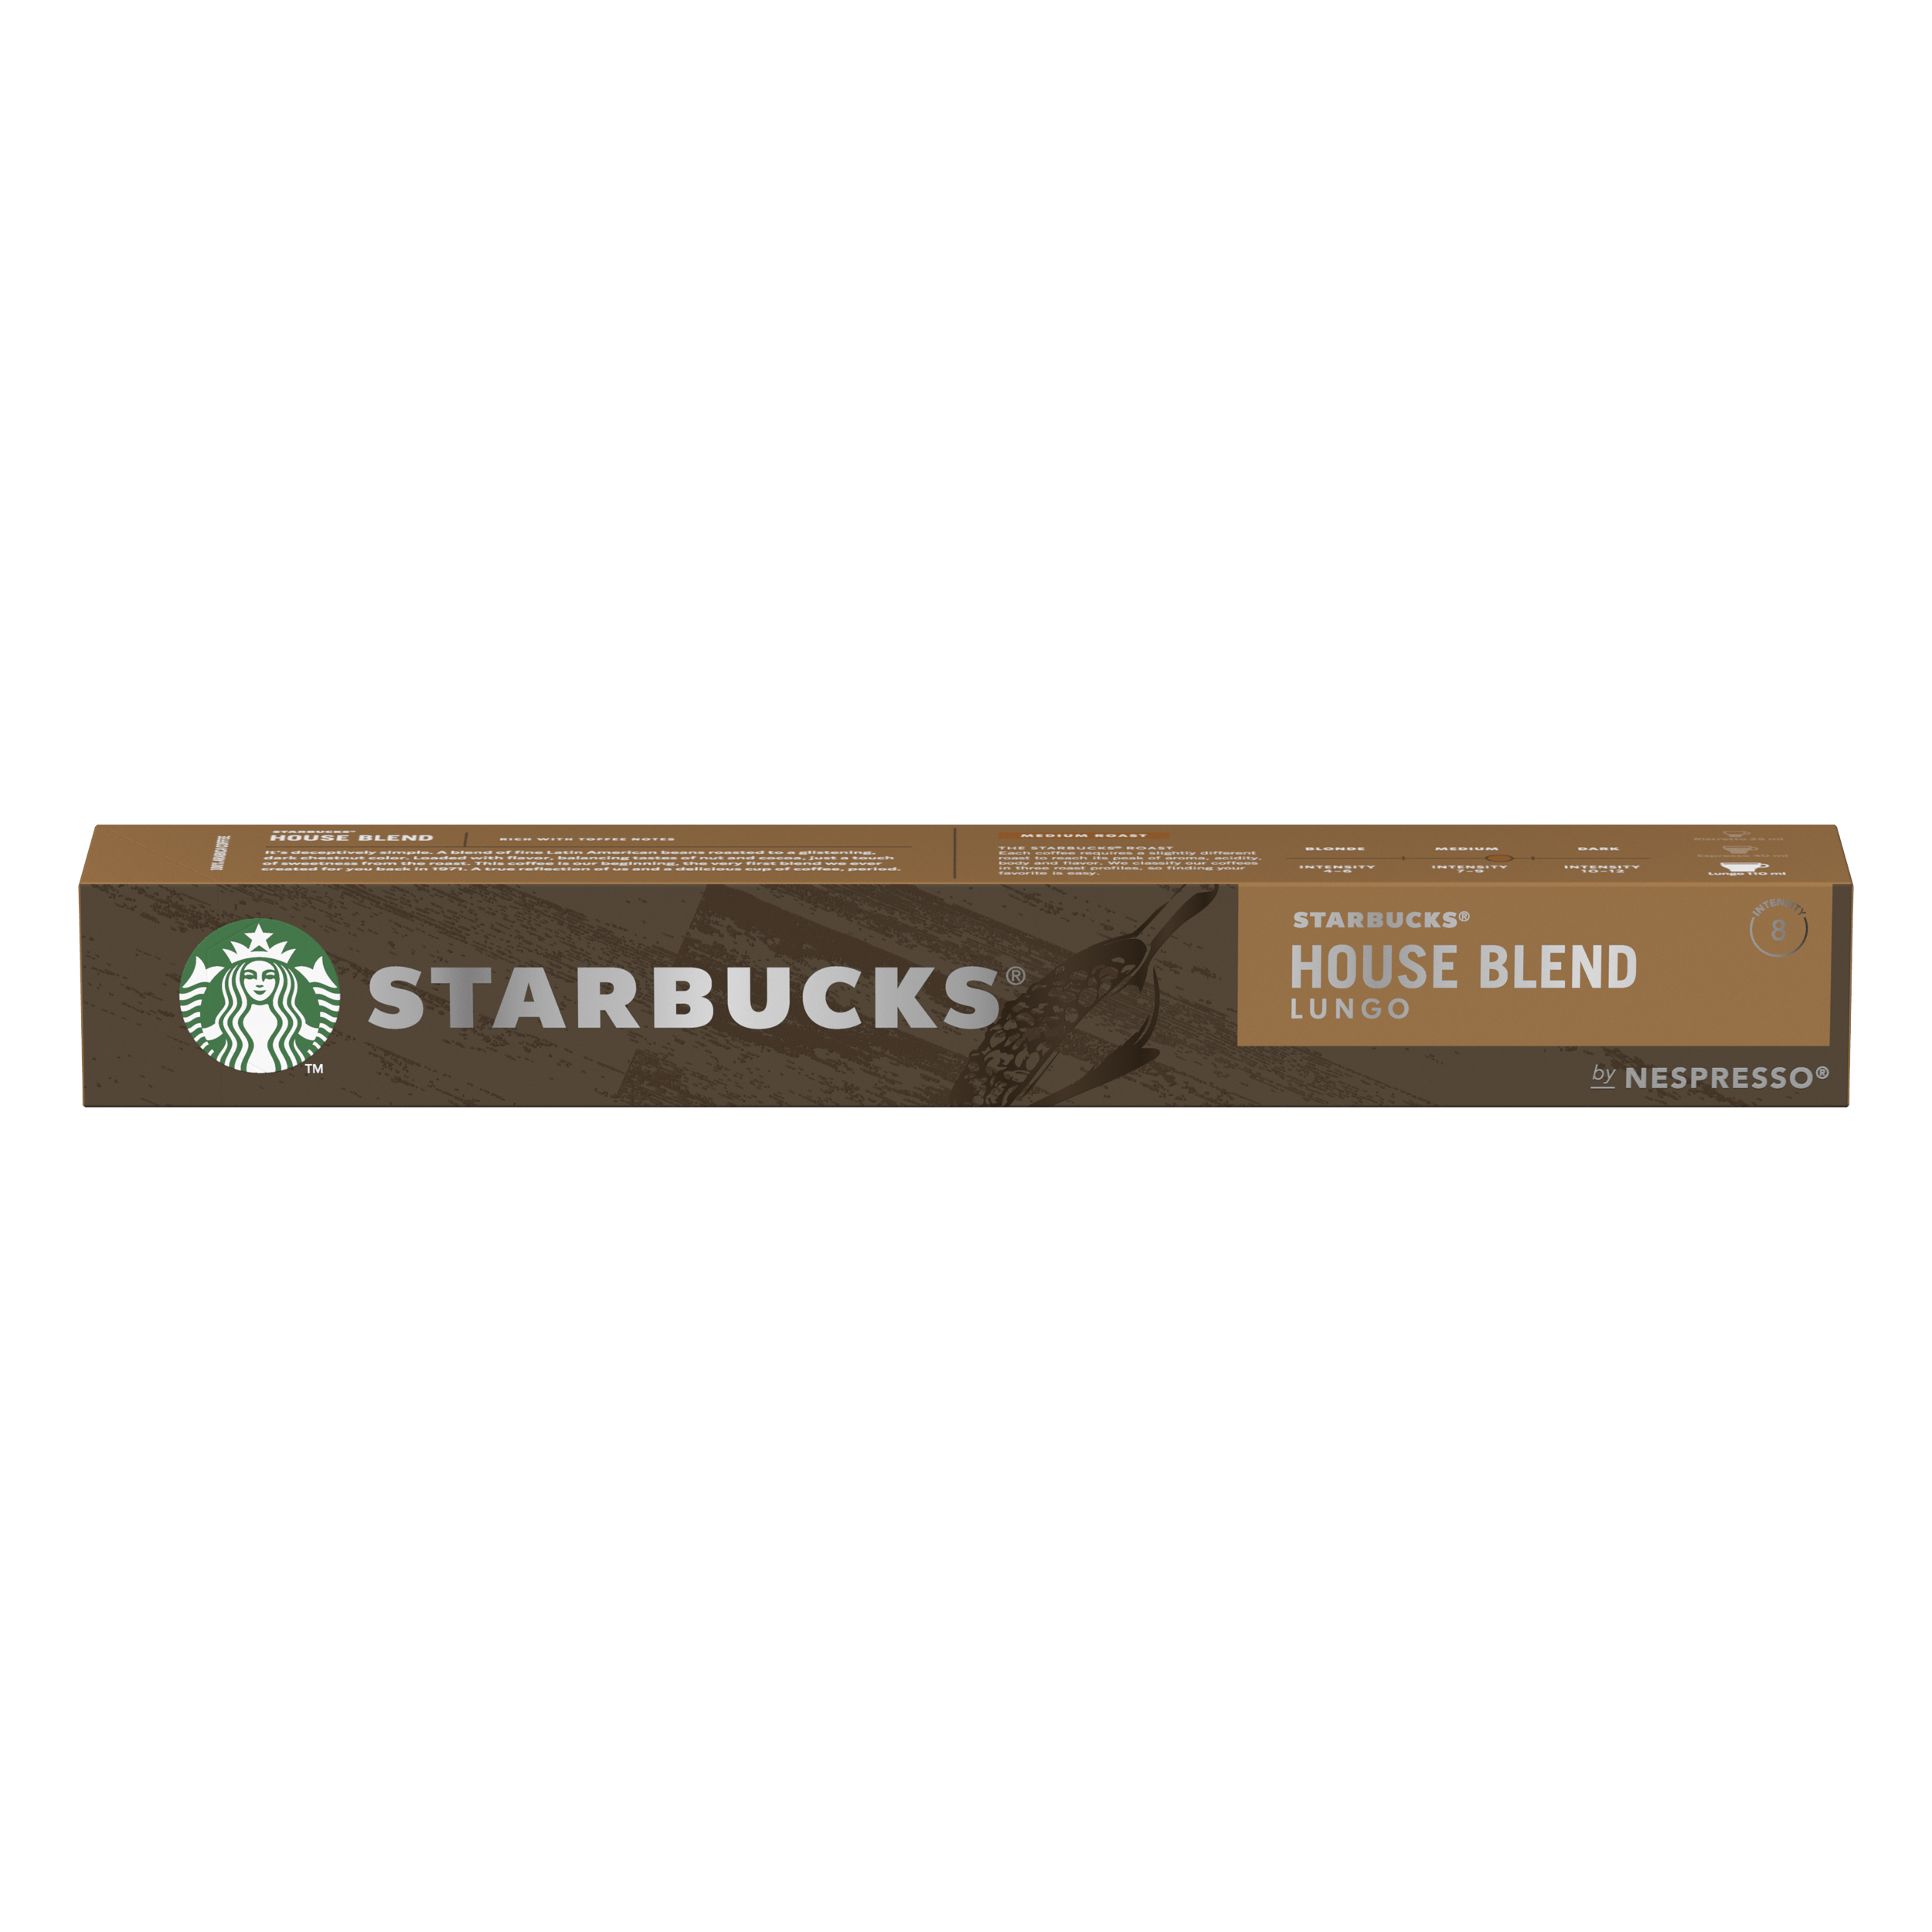 Instant coffee Starbucks by Nespresso House Blend Lungo 12x57g 120 Pods Ref 12423278